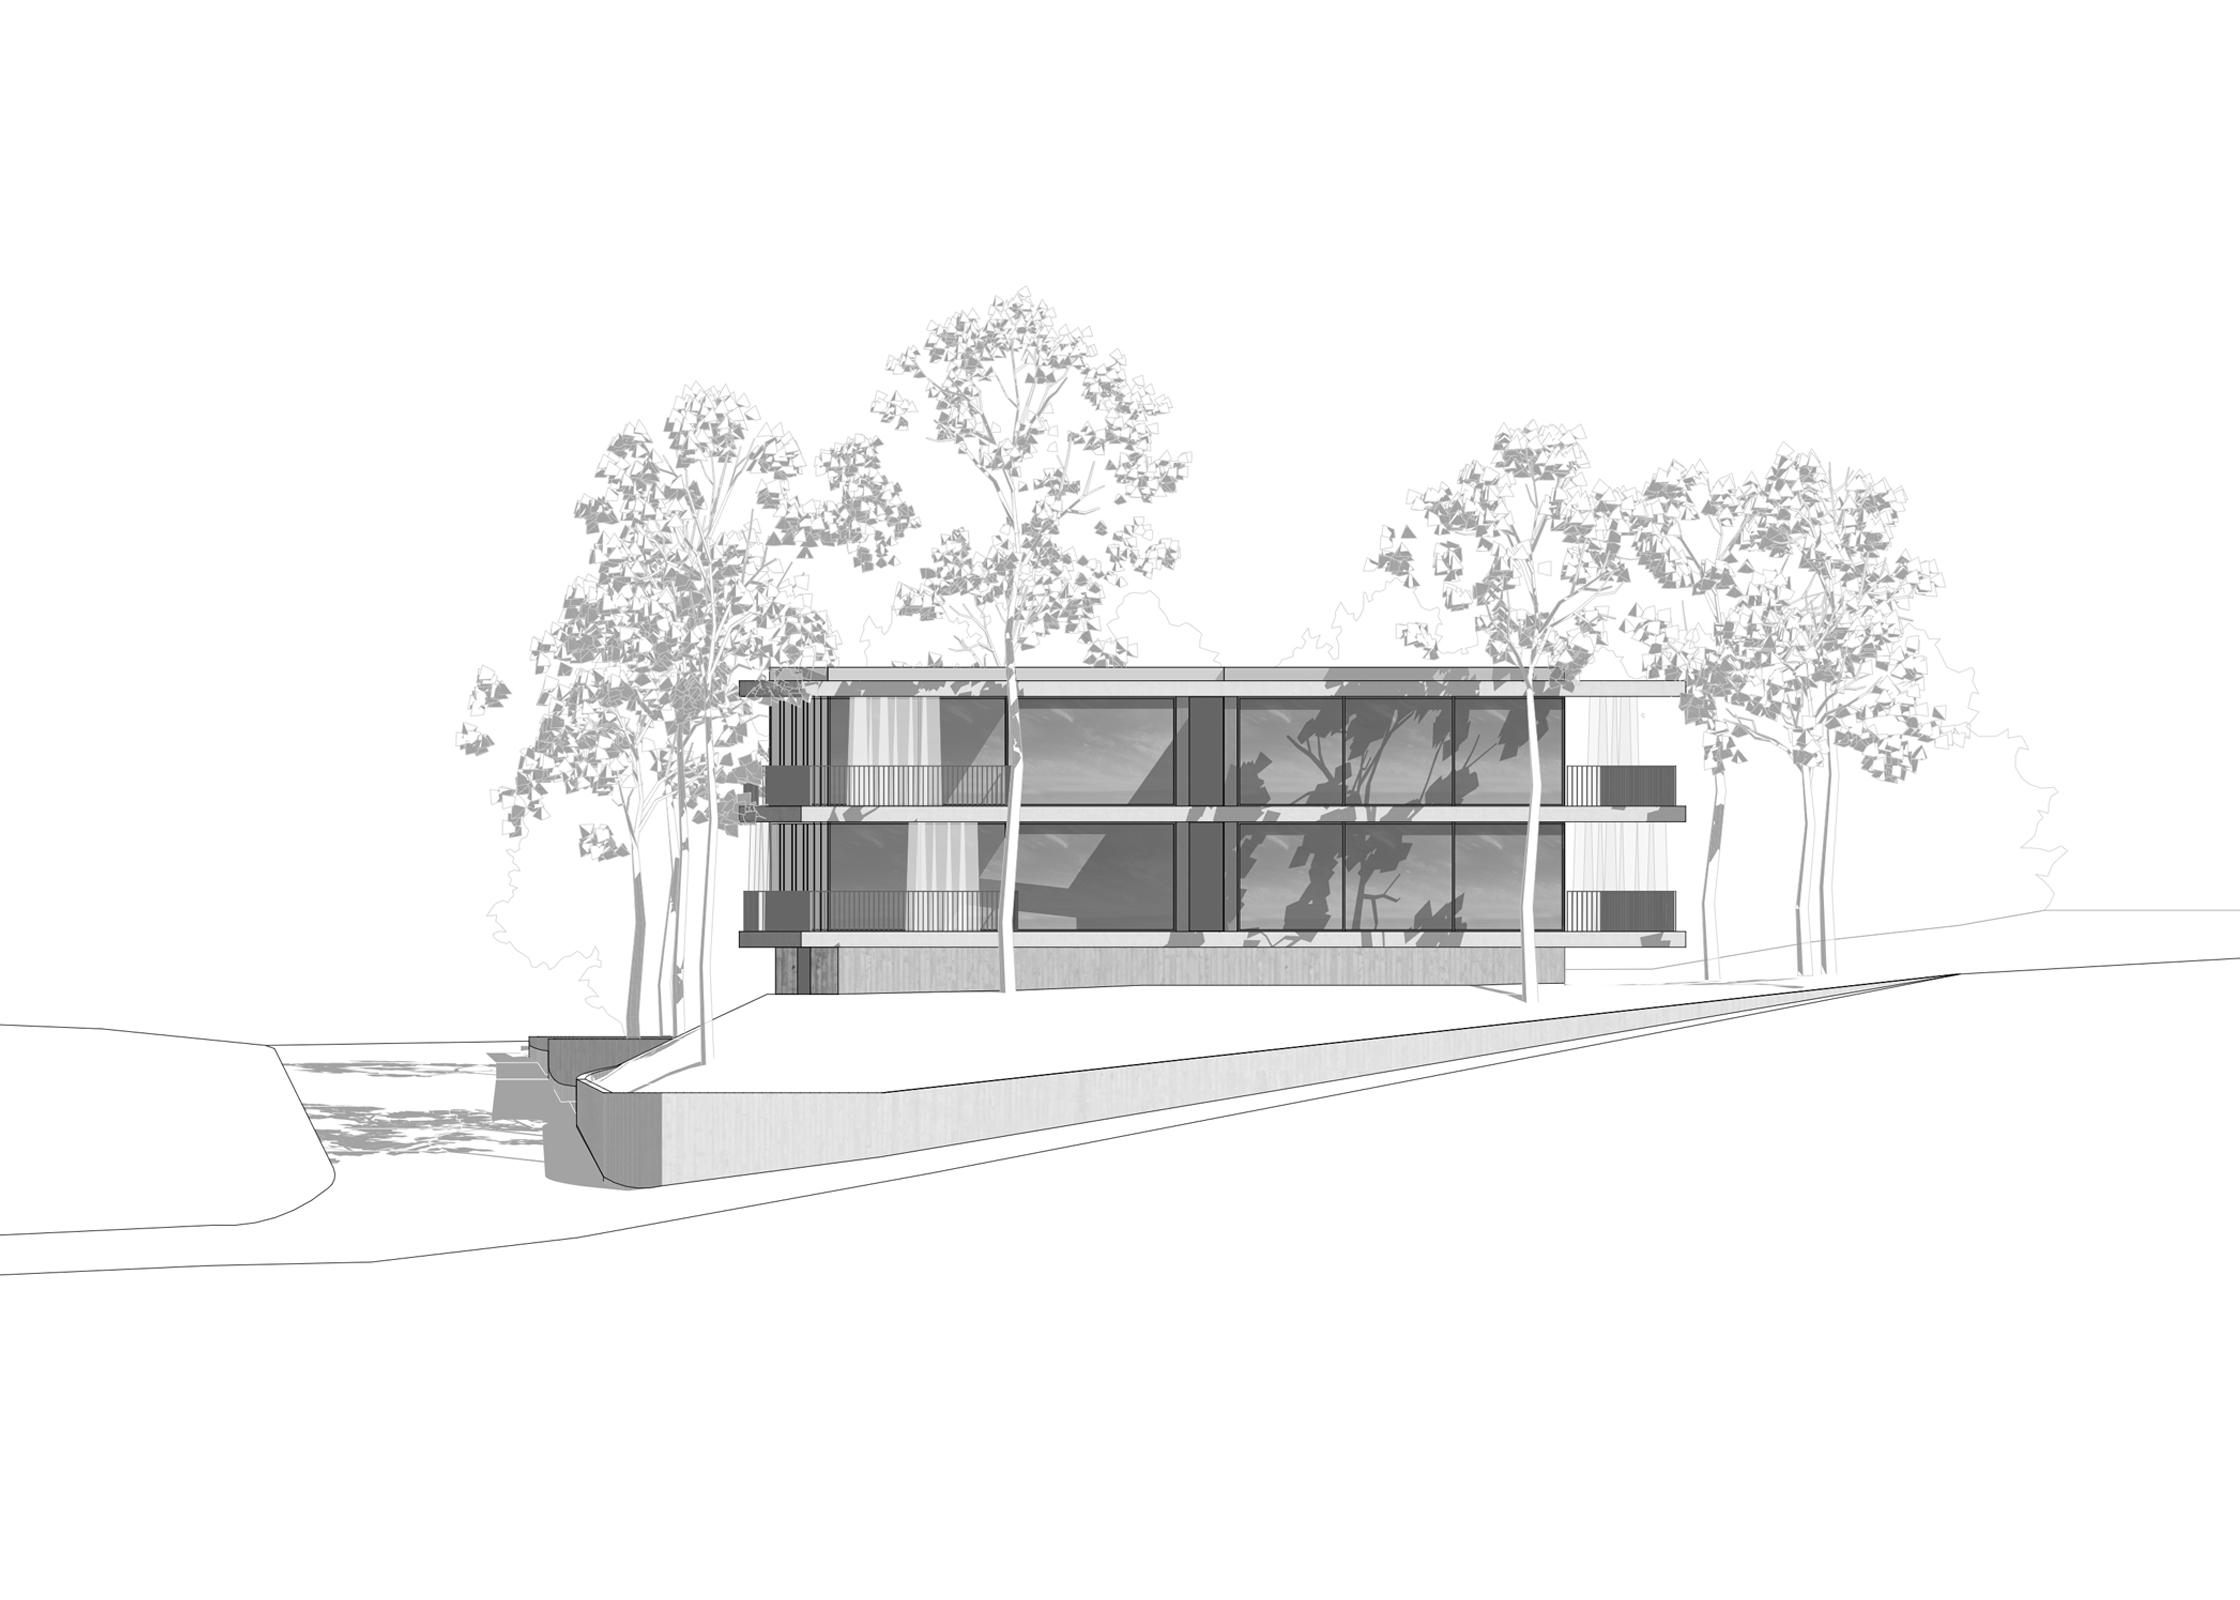 Mehrfamilienhaus Mühlerain Meilen, Eggenspieler Architekten AG